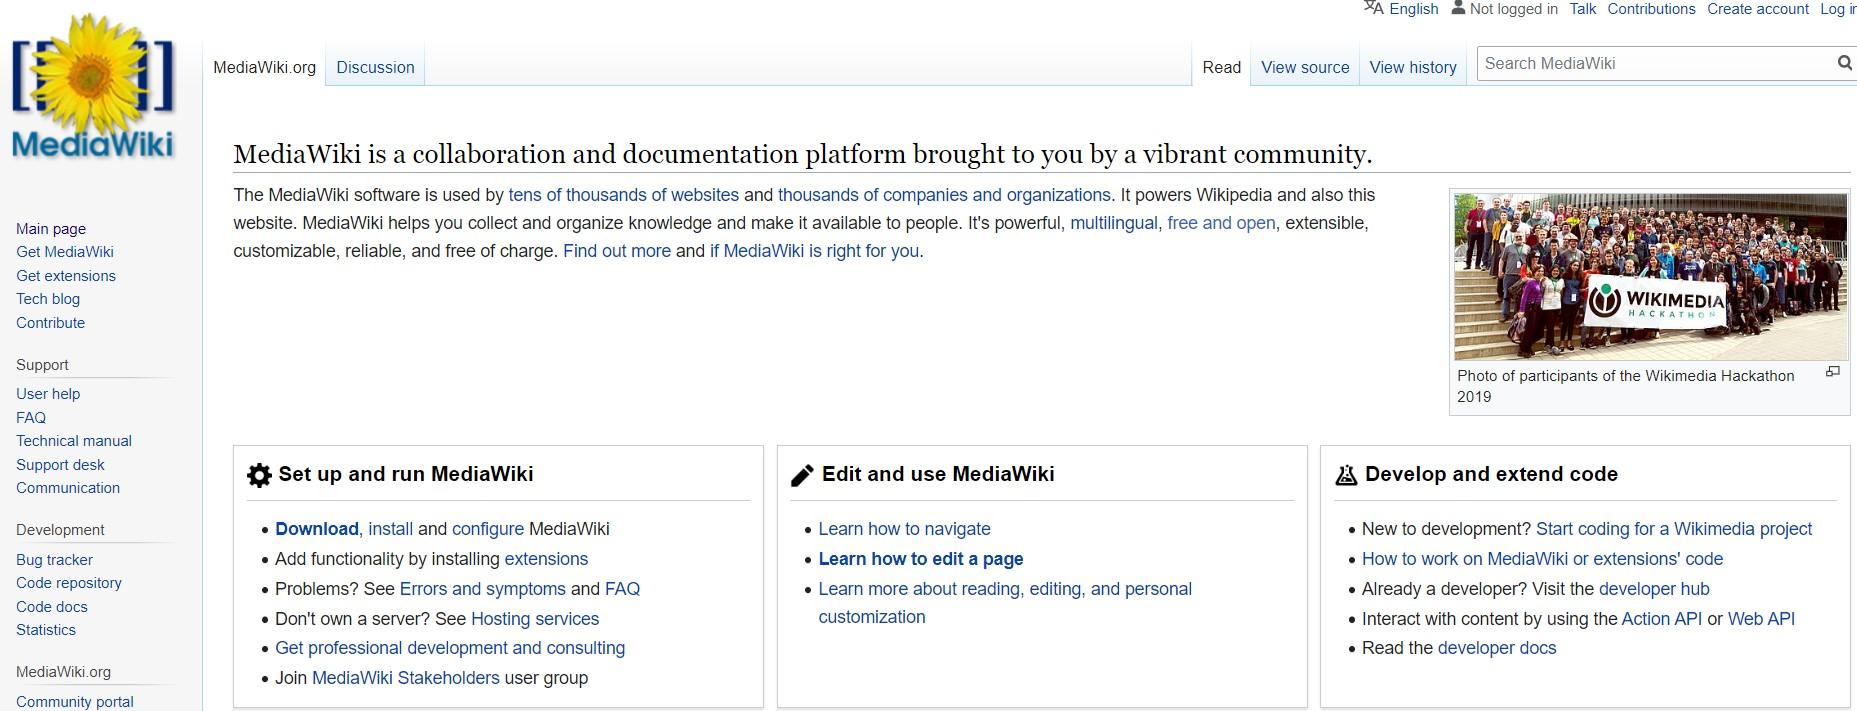 The MediaWiki website